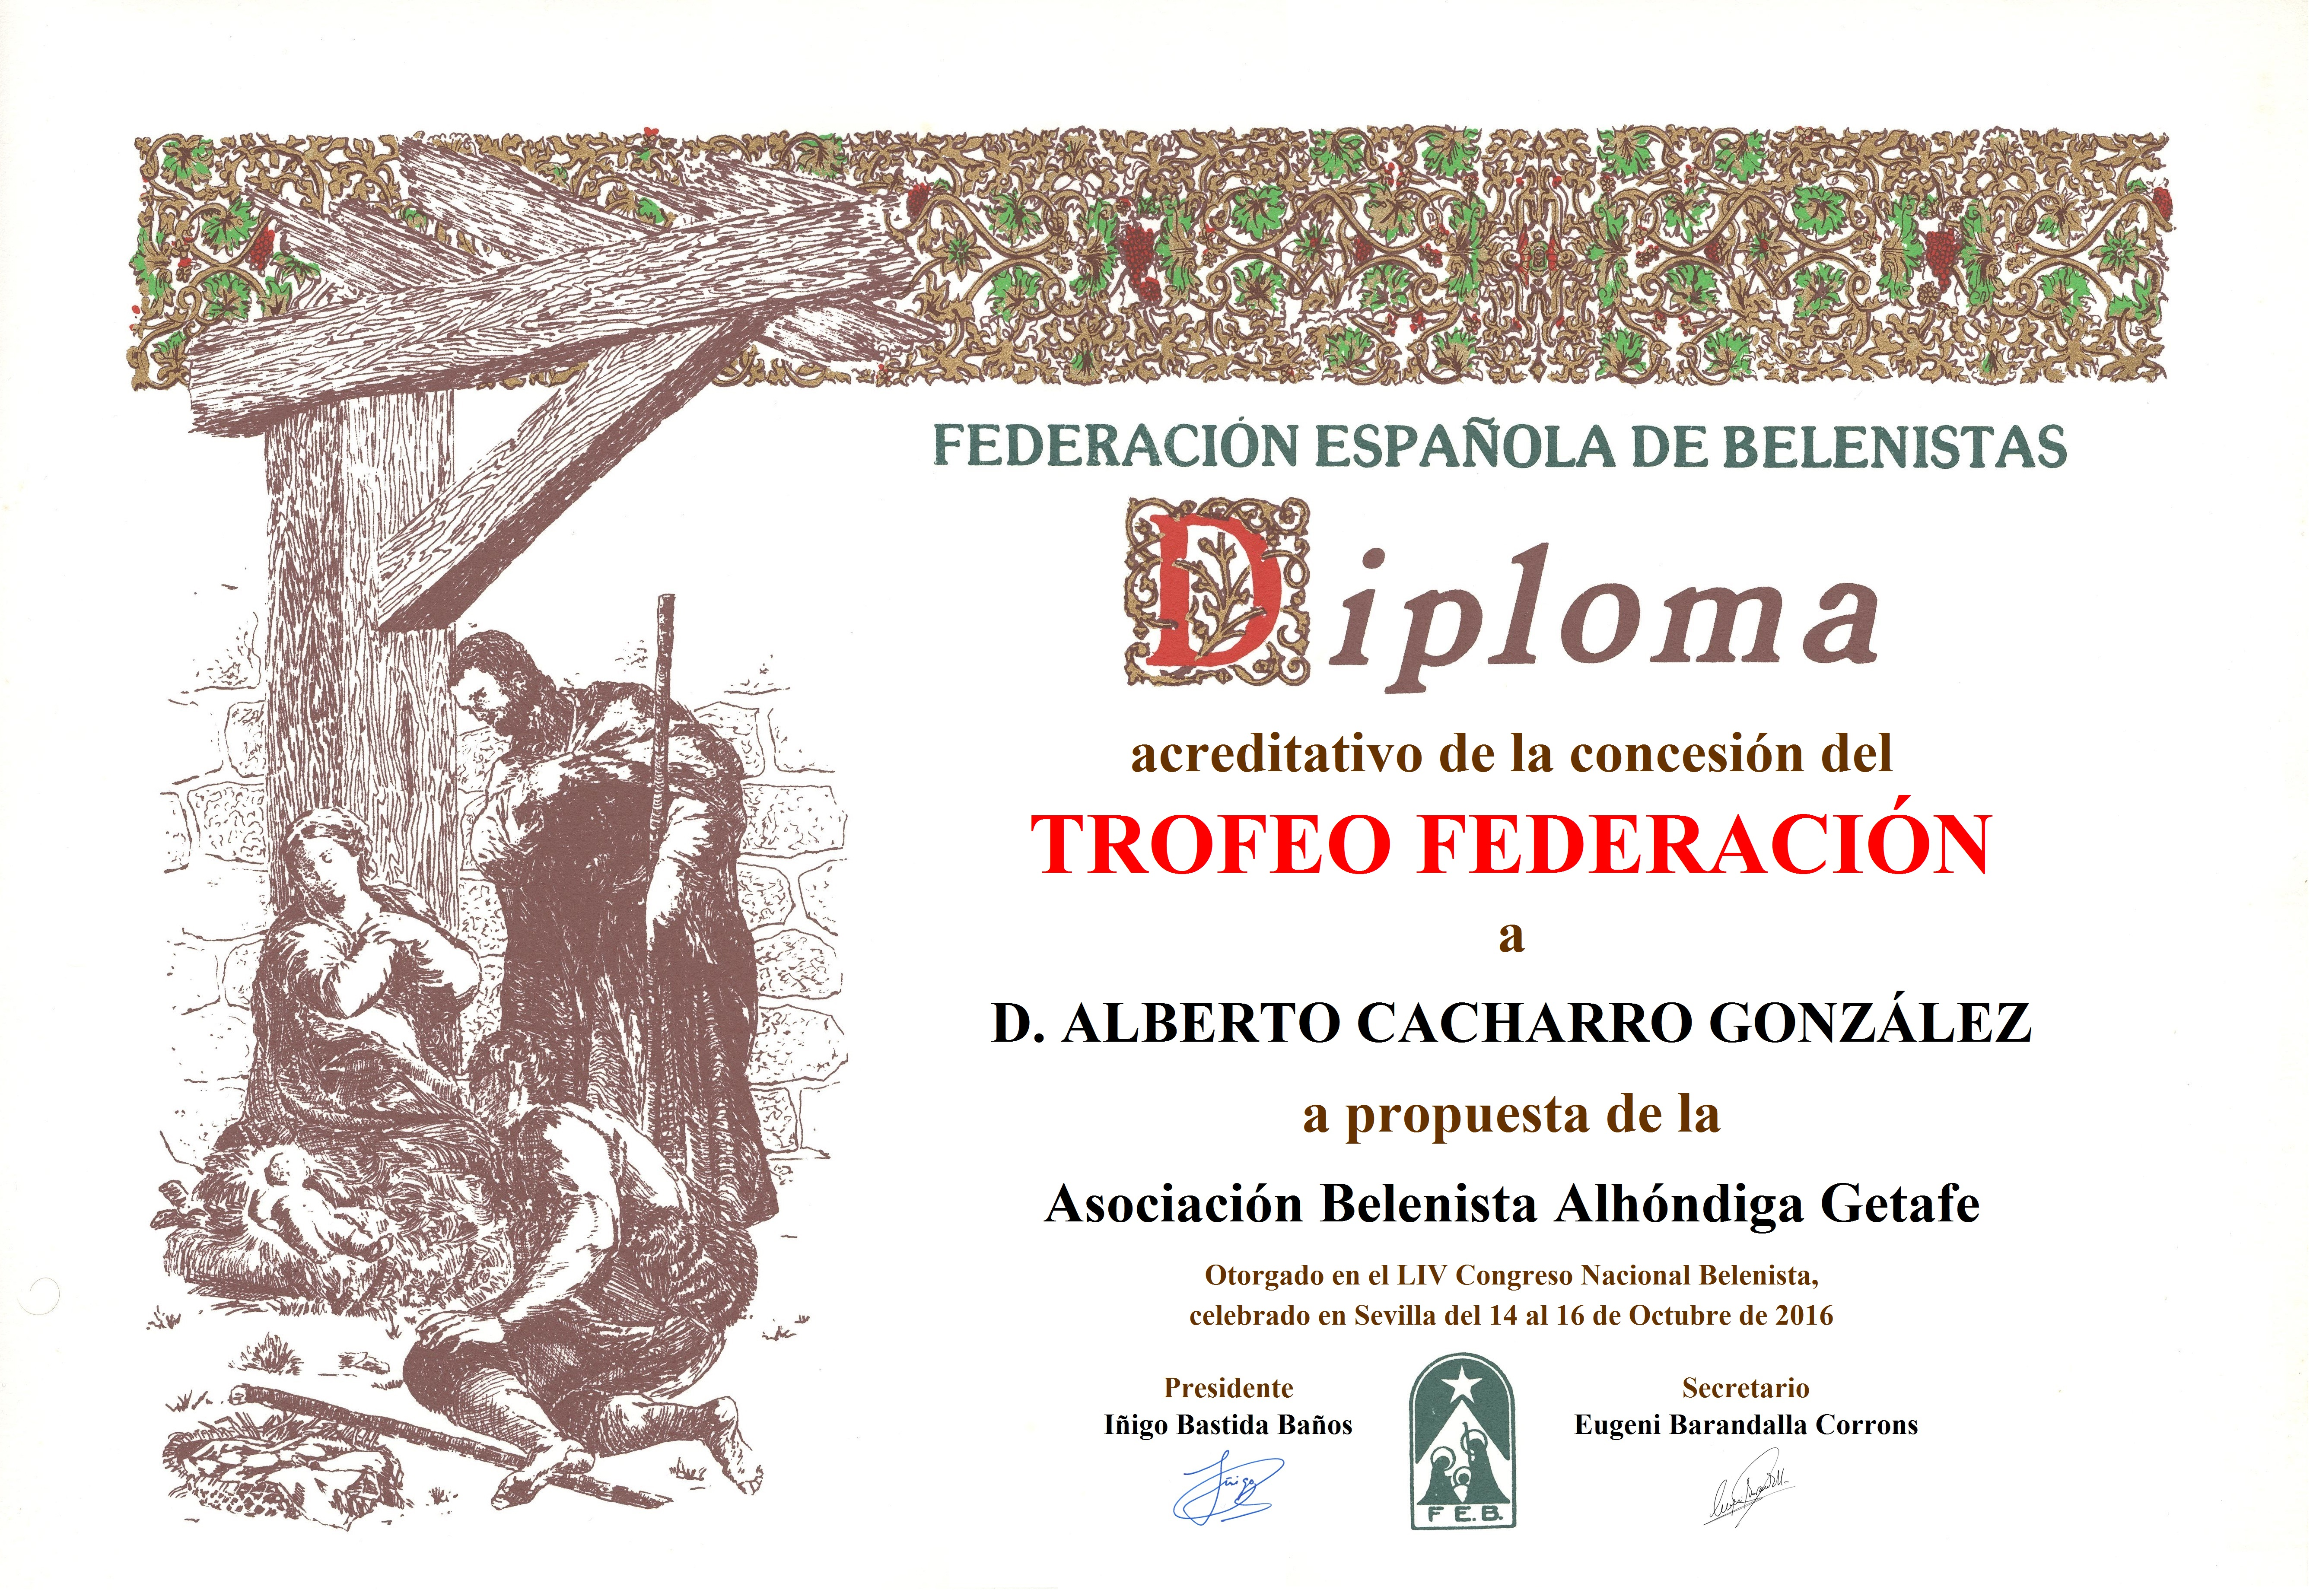 Alberto Cacharro González - Diploma Trofeo FEB 2016